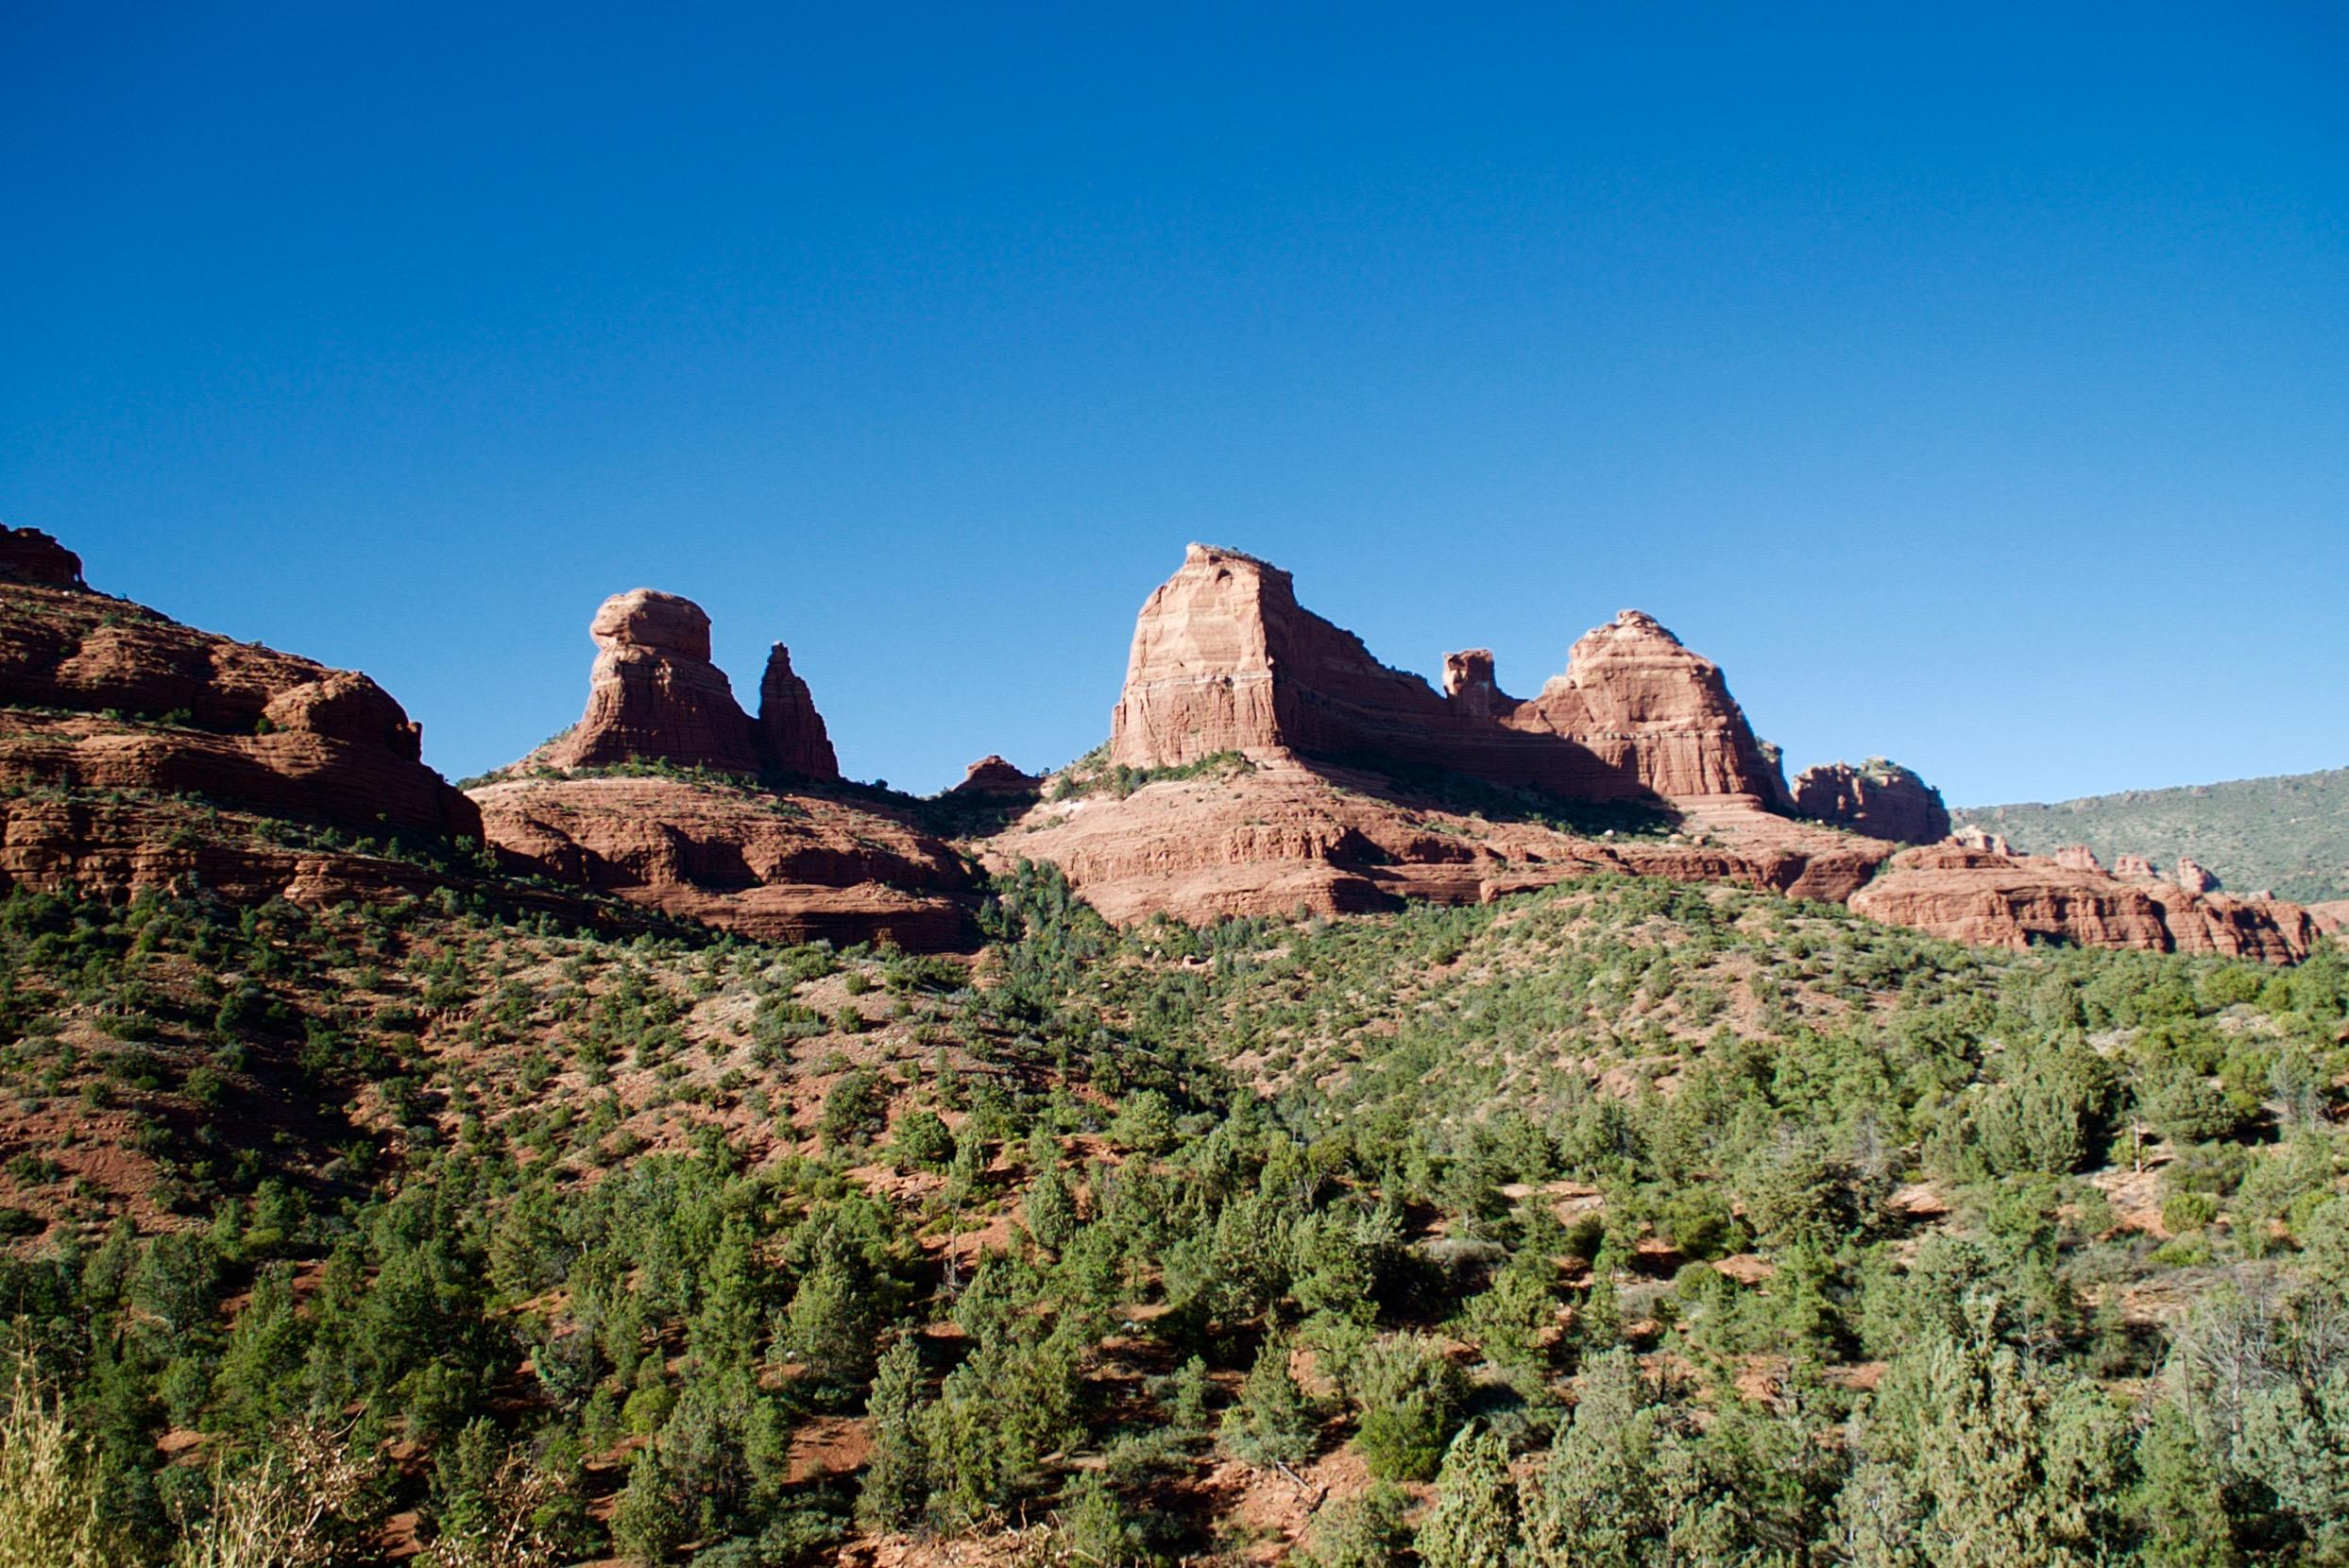 Iconic red rock formations in Sedona, Arizona